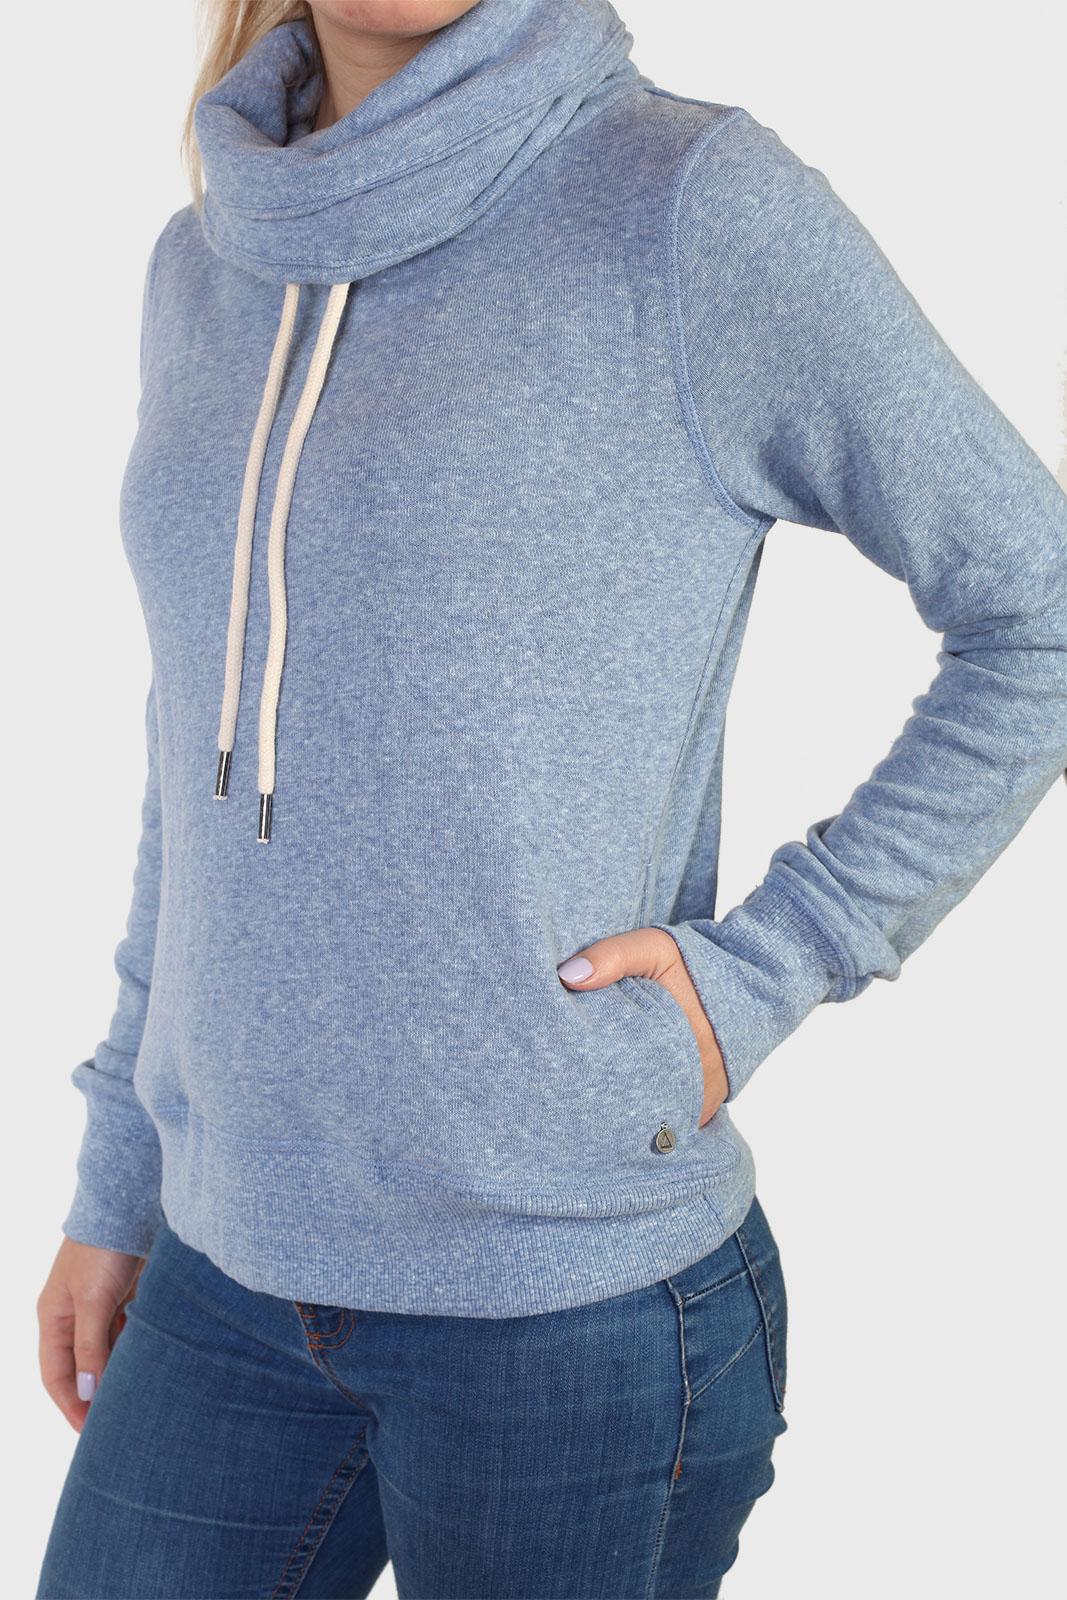 Голубой женский свитер худи от бренда Barbados